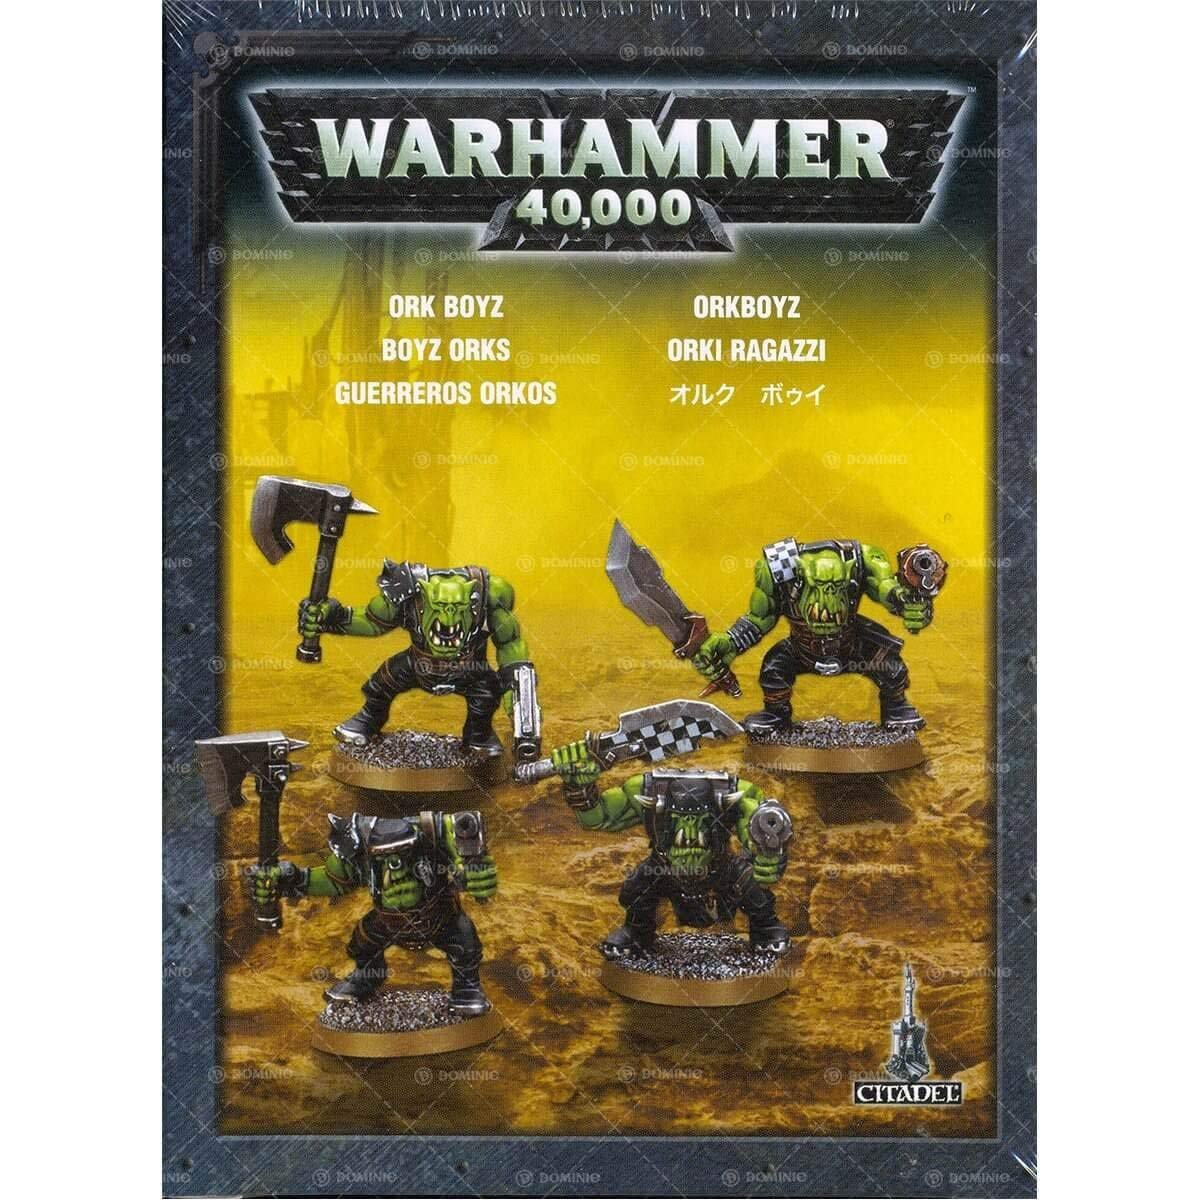 Games Workshop Jeux Atelier 99120103015Warhammer 101600cm Ork Boyz Action Figure